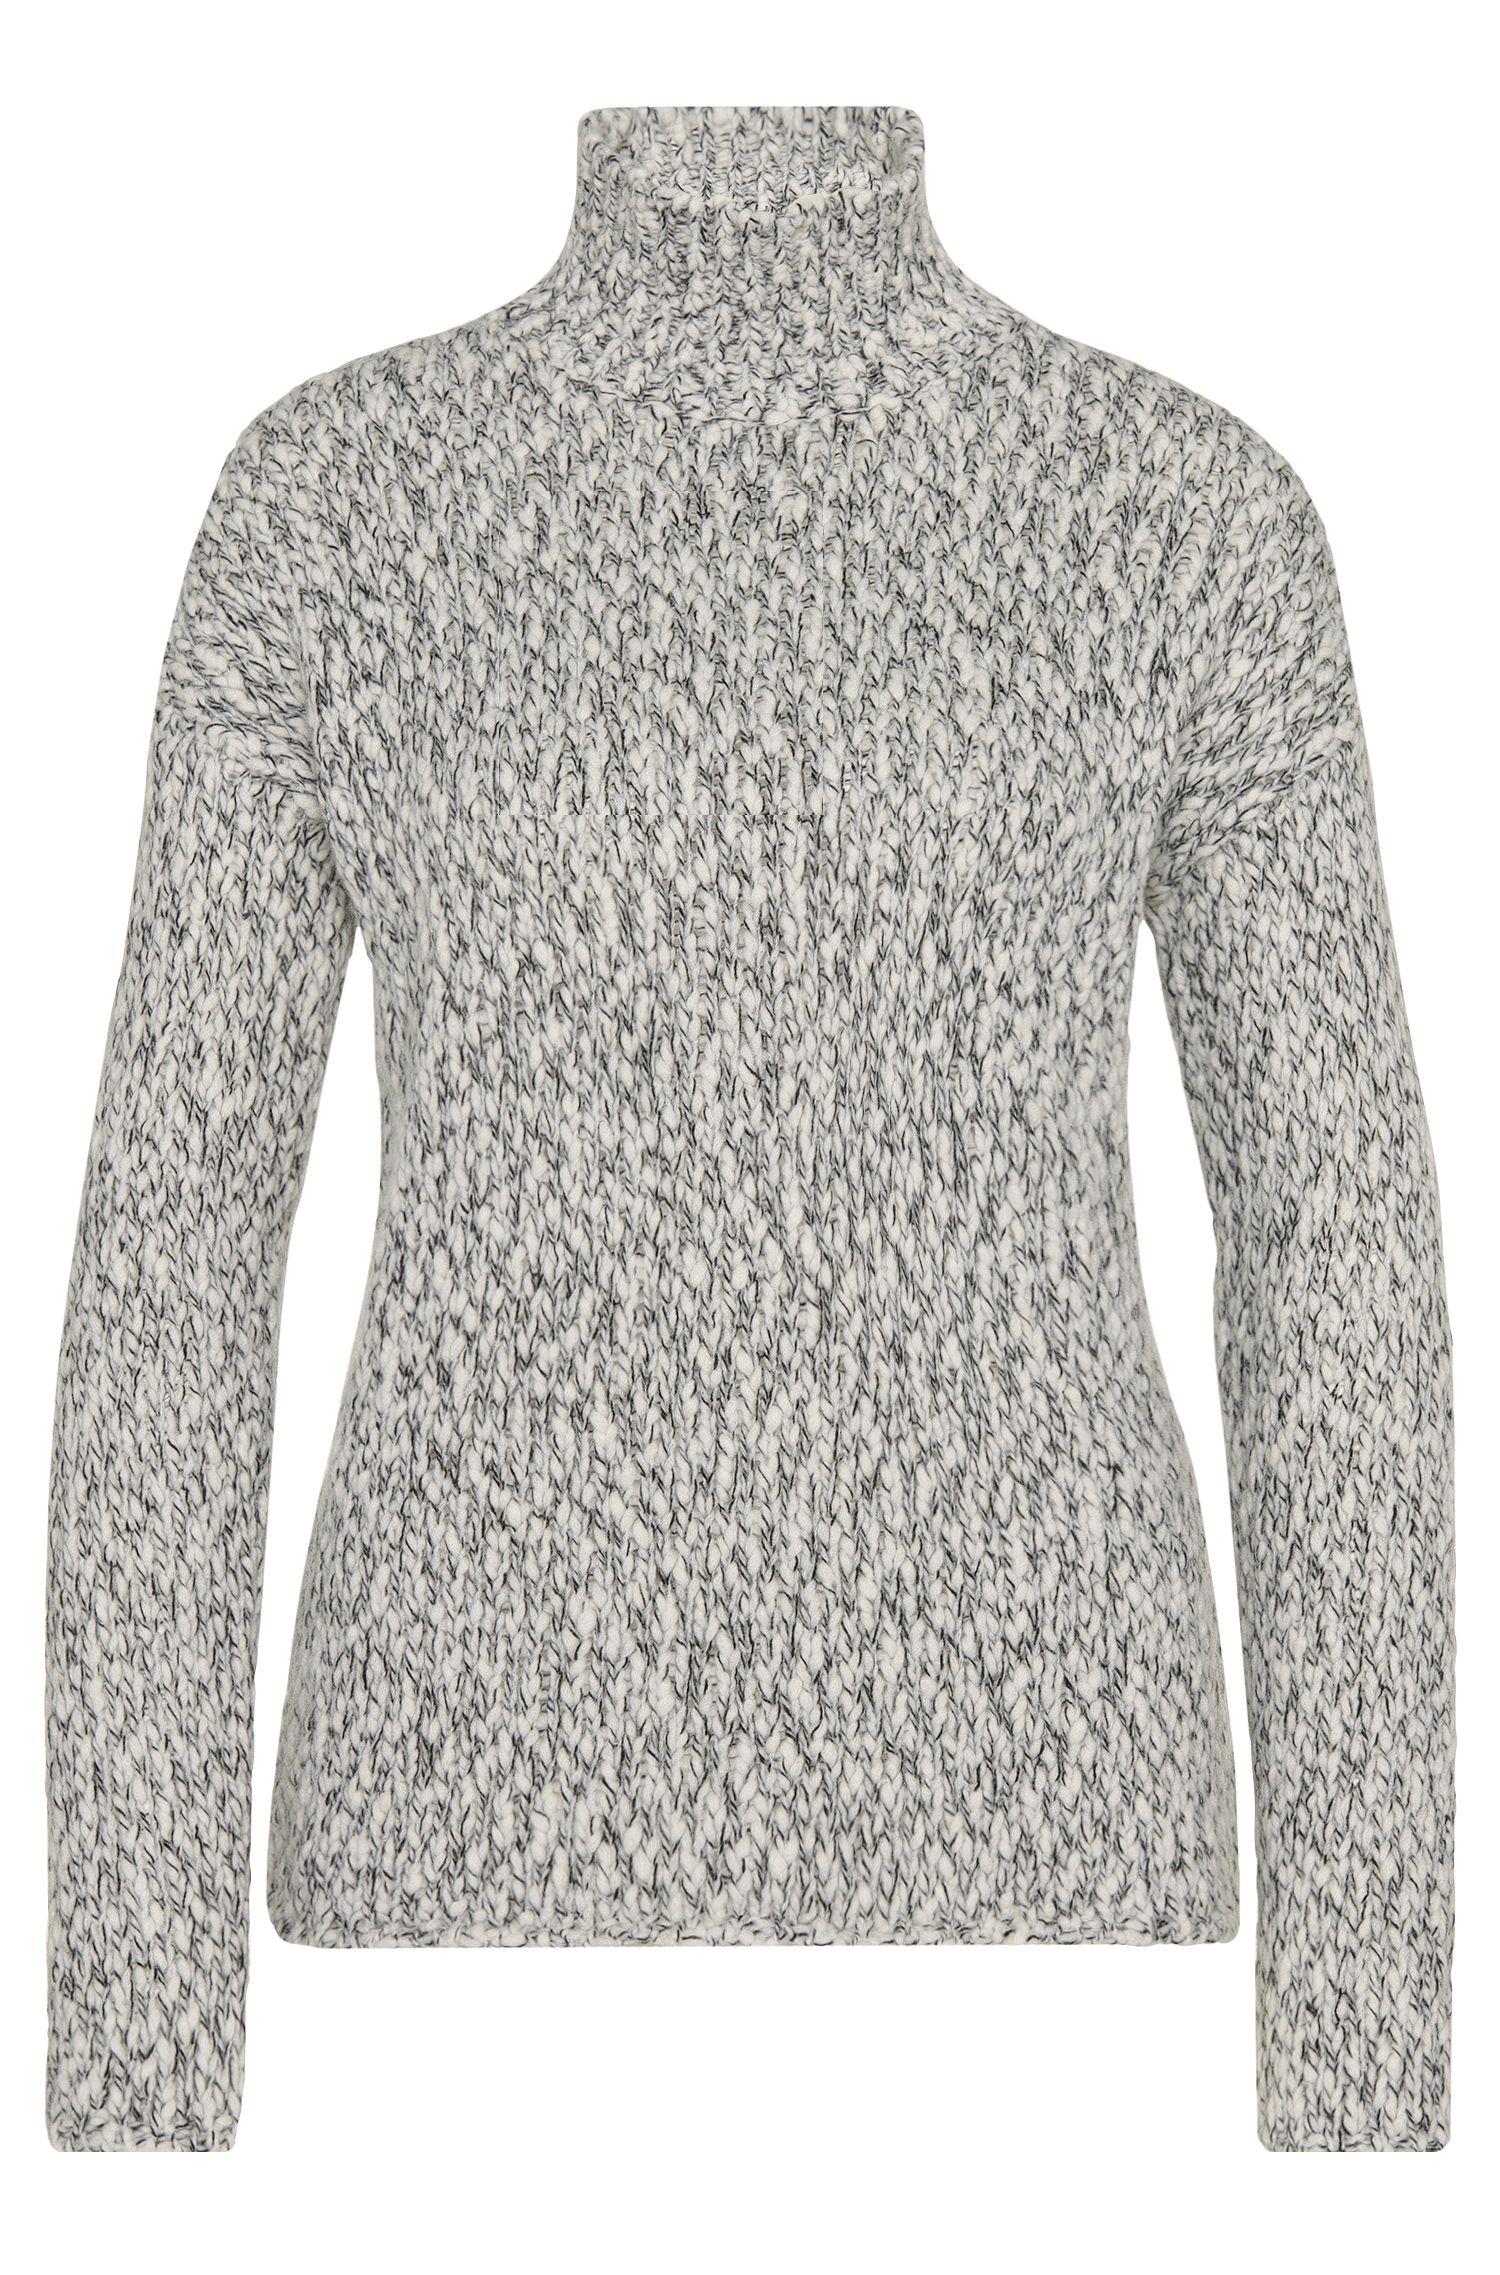 'Starly'   Wool Blend Mock Turtleneck